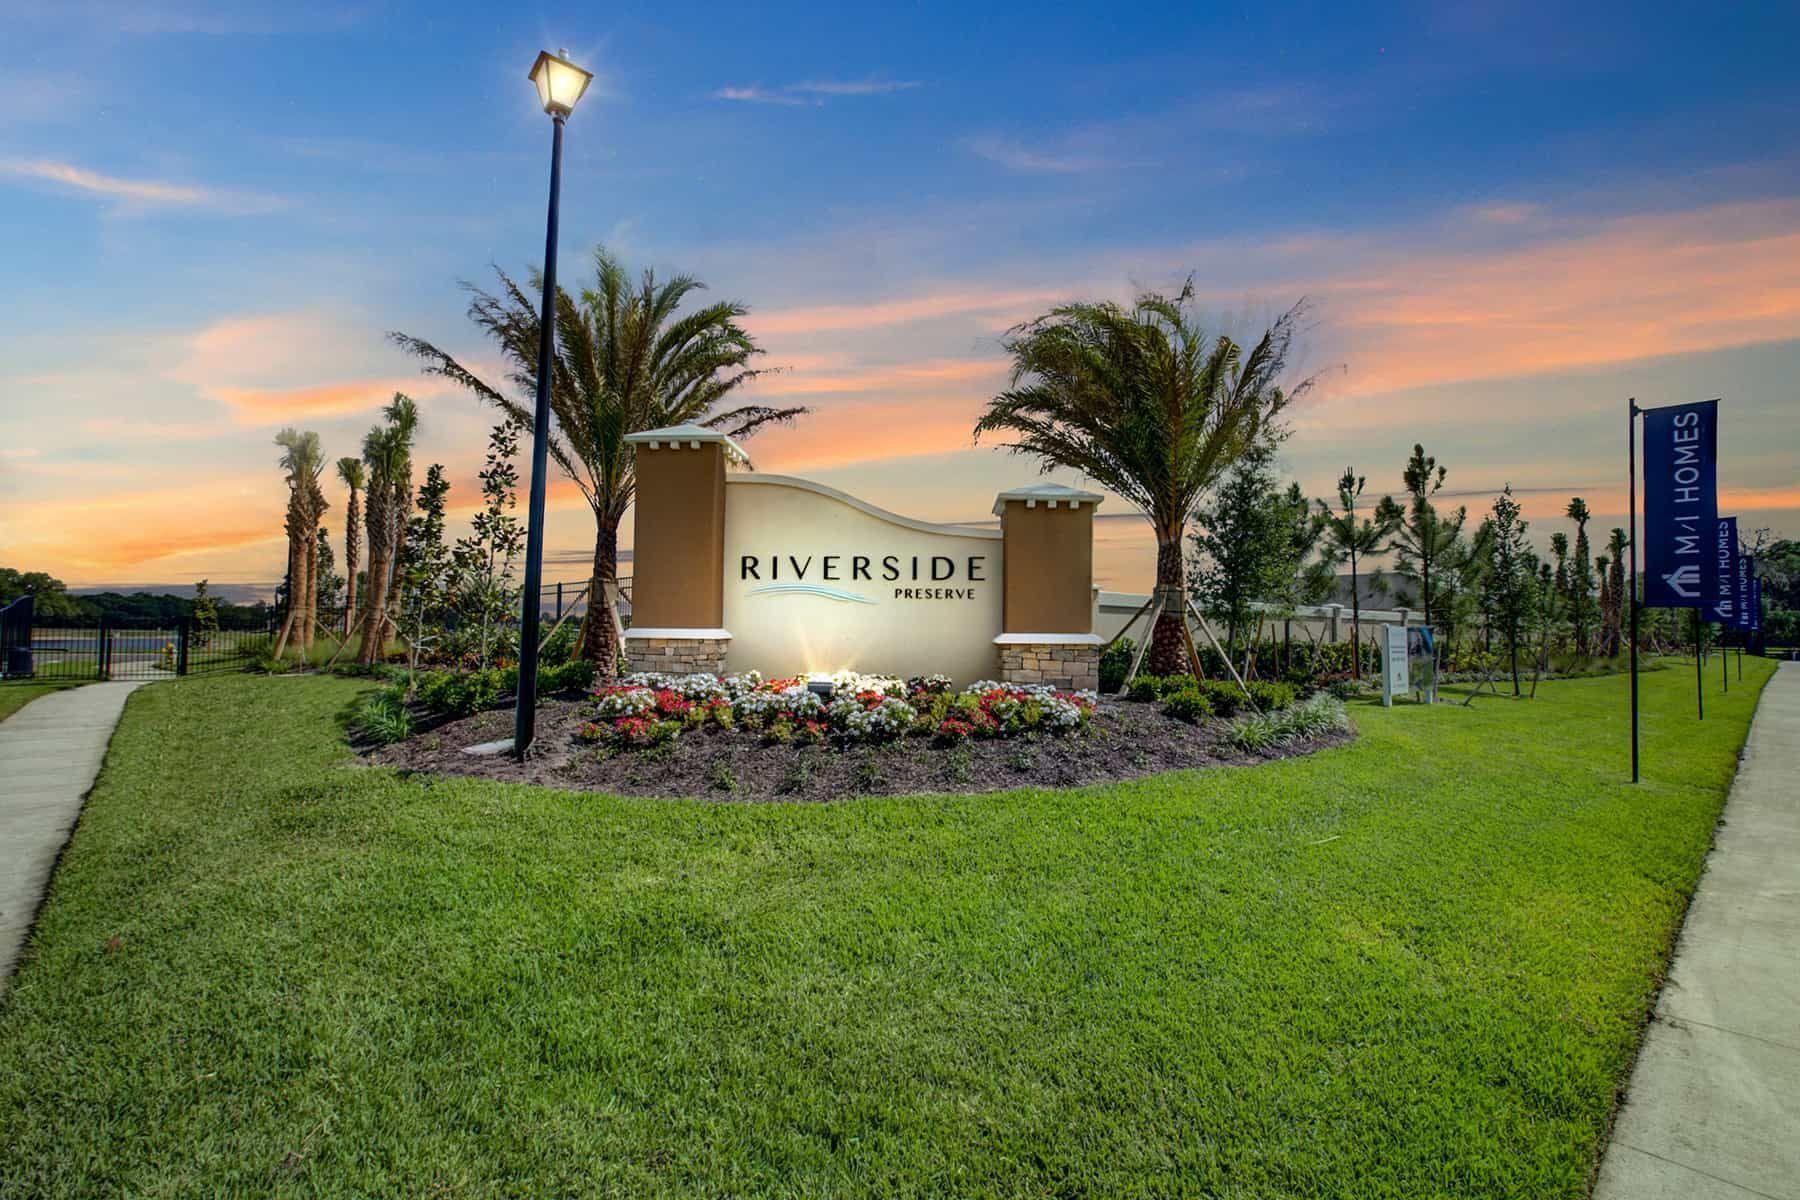 Riverside Entrance